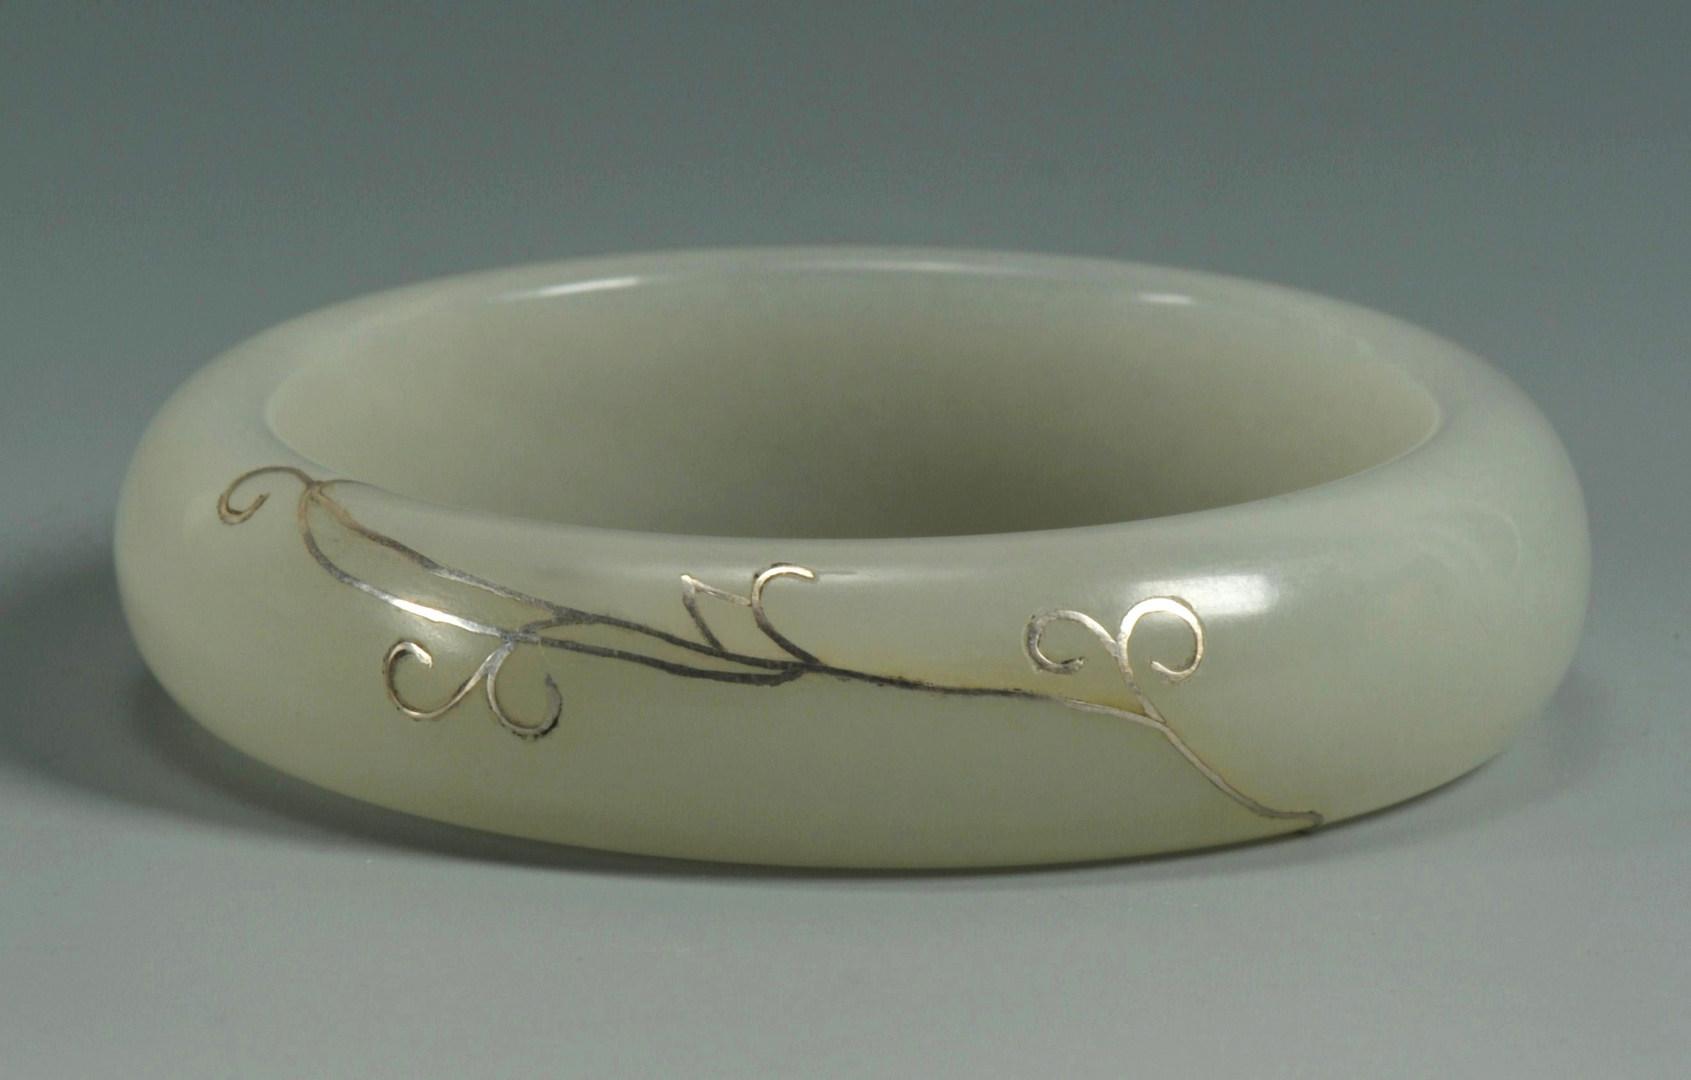 Lot 182: Chinese Celadon Jade Bangle w/ Silver Inlay